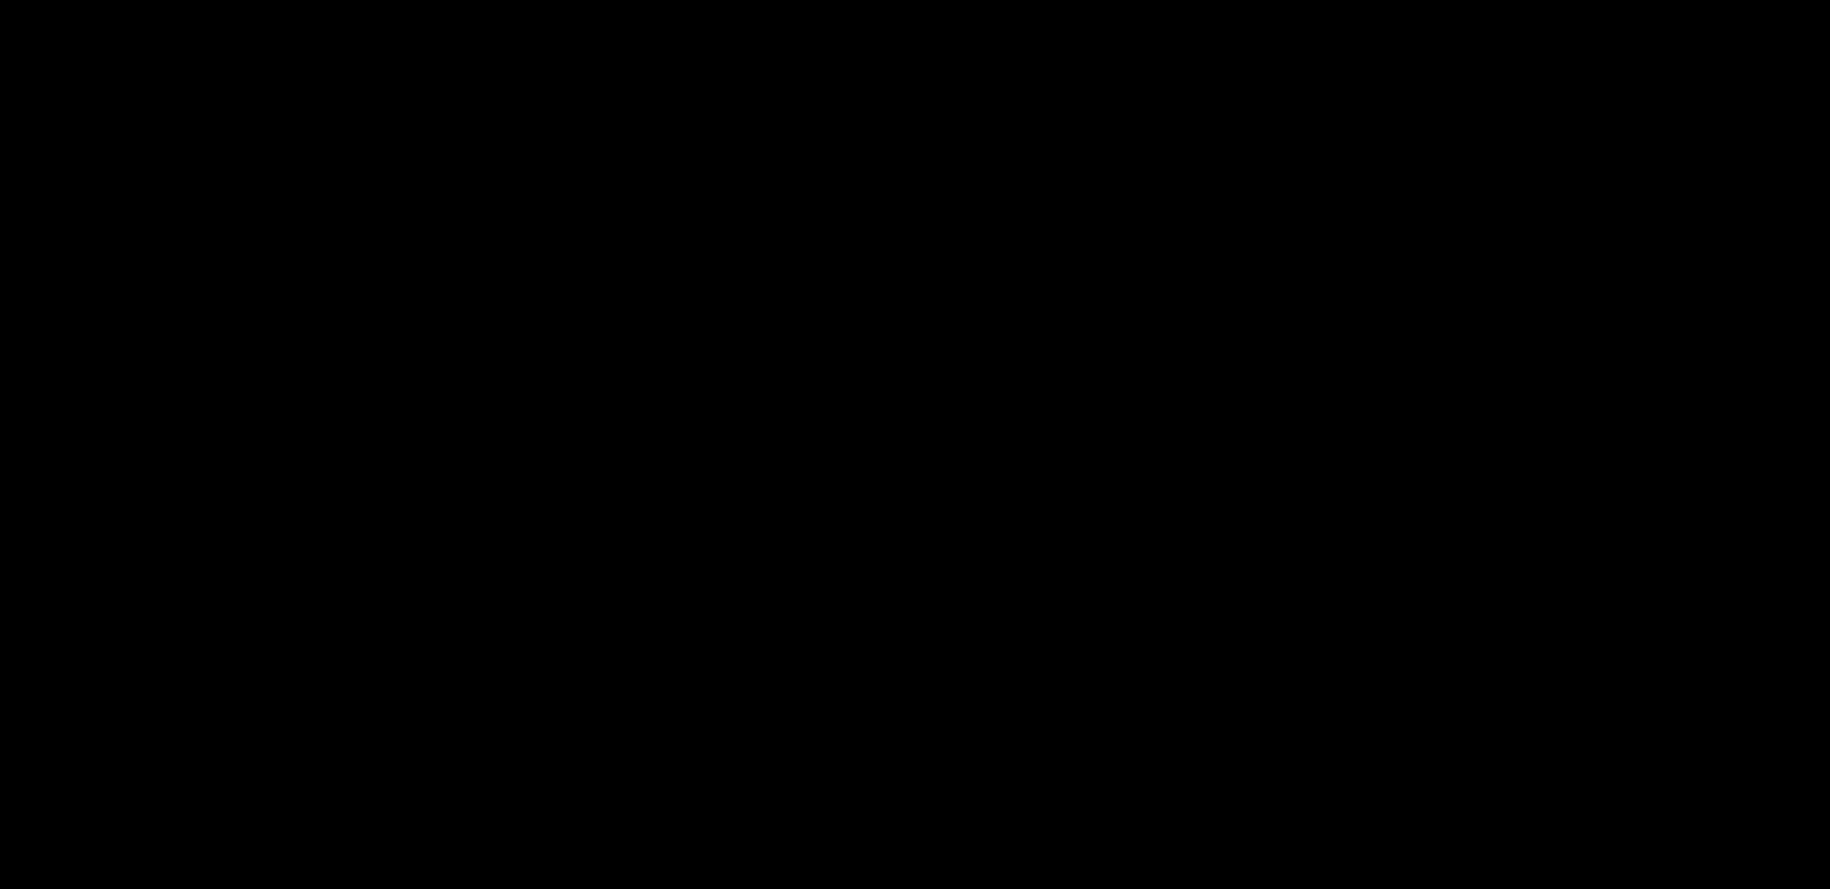 ho1-3-5